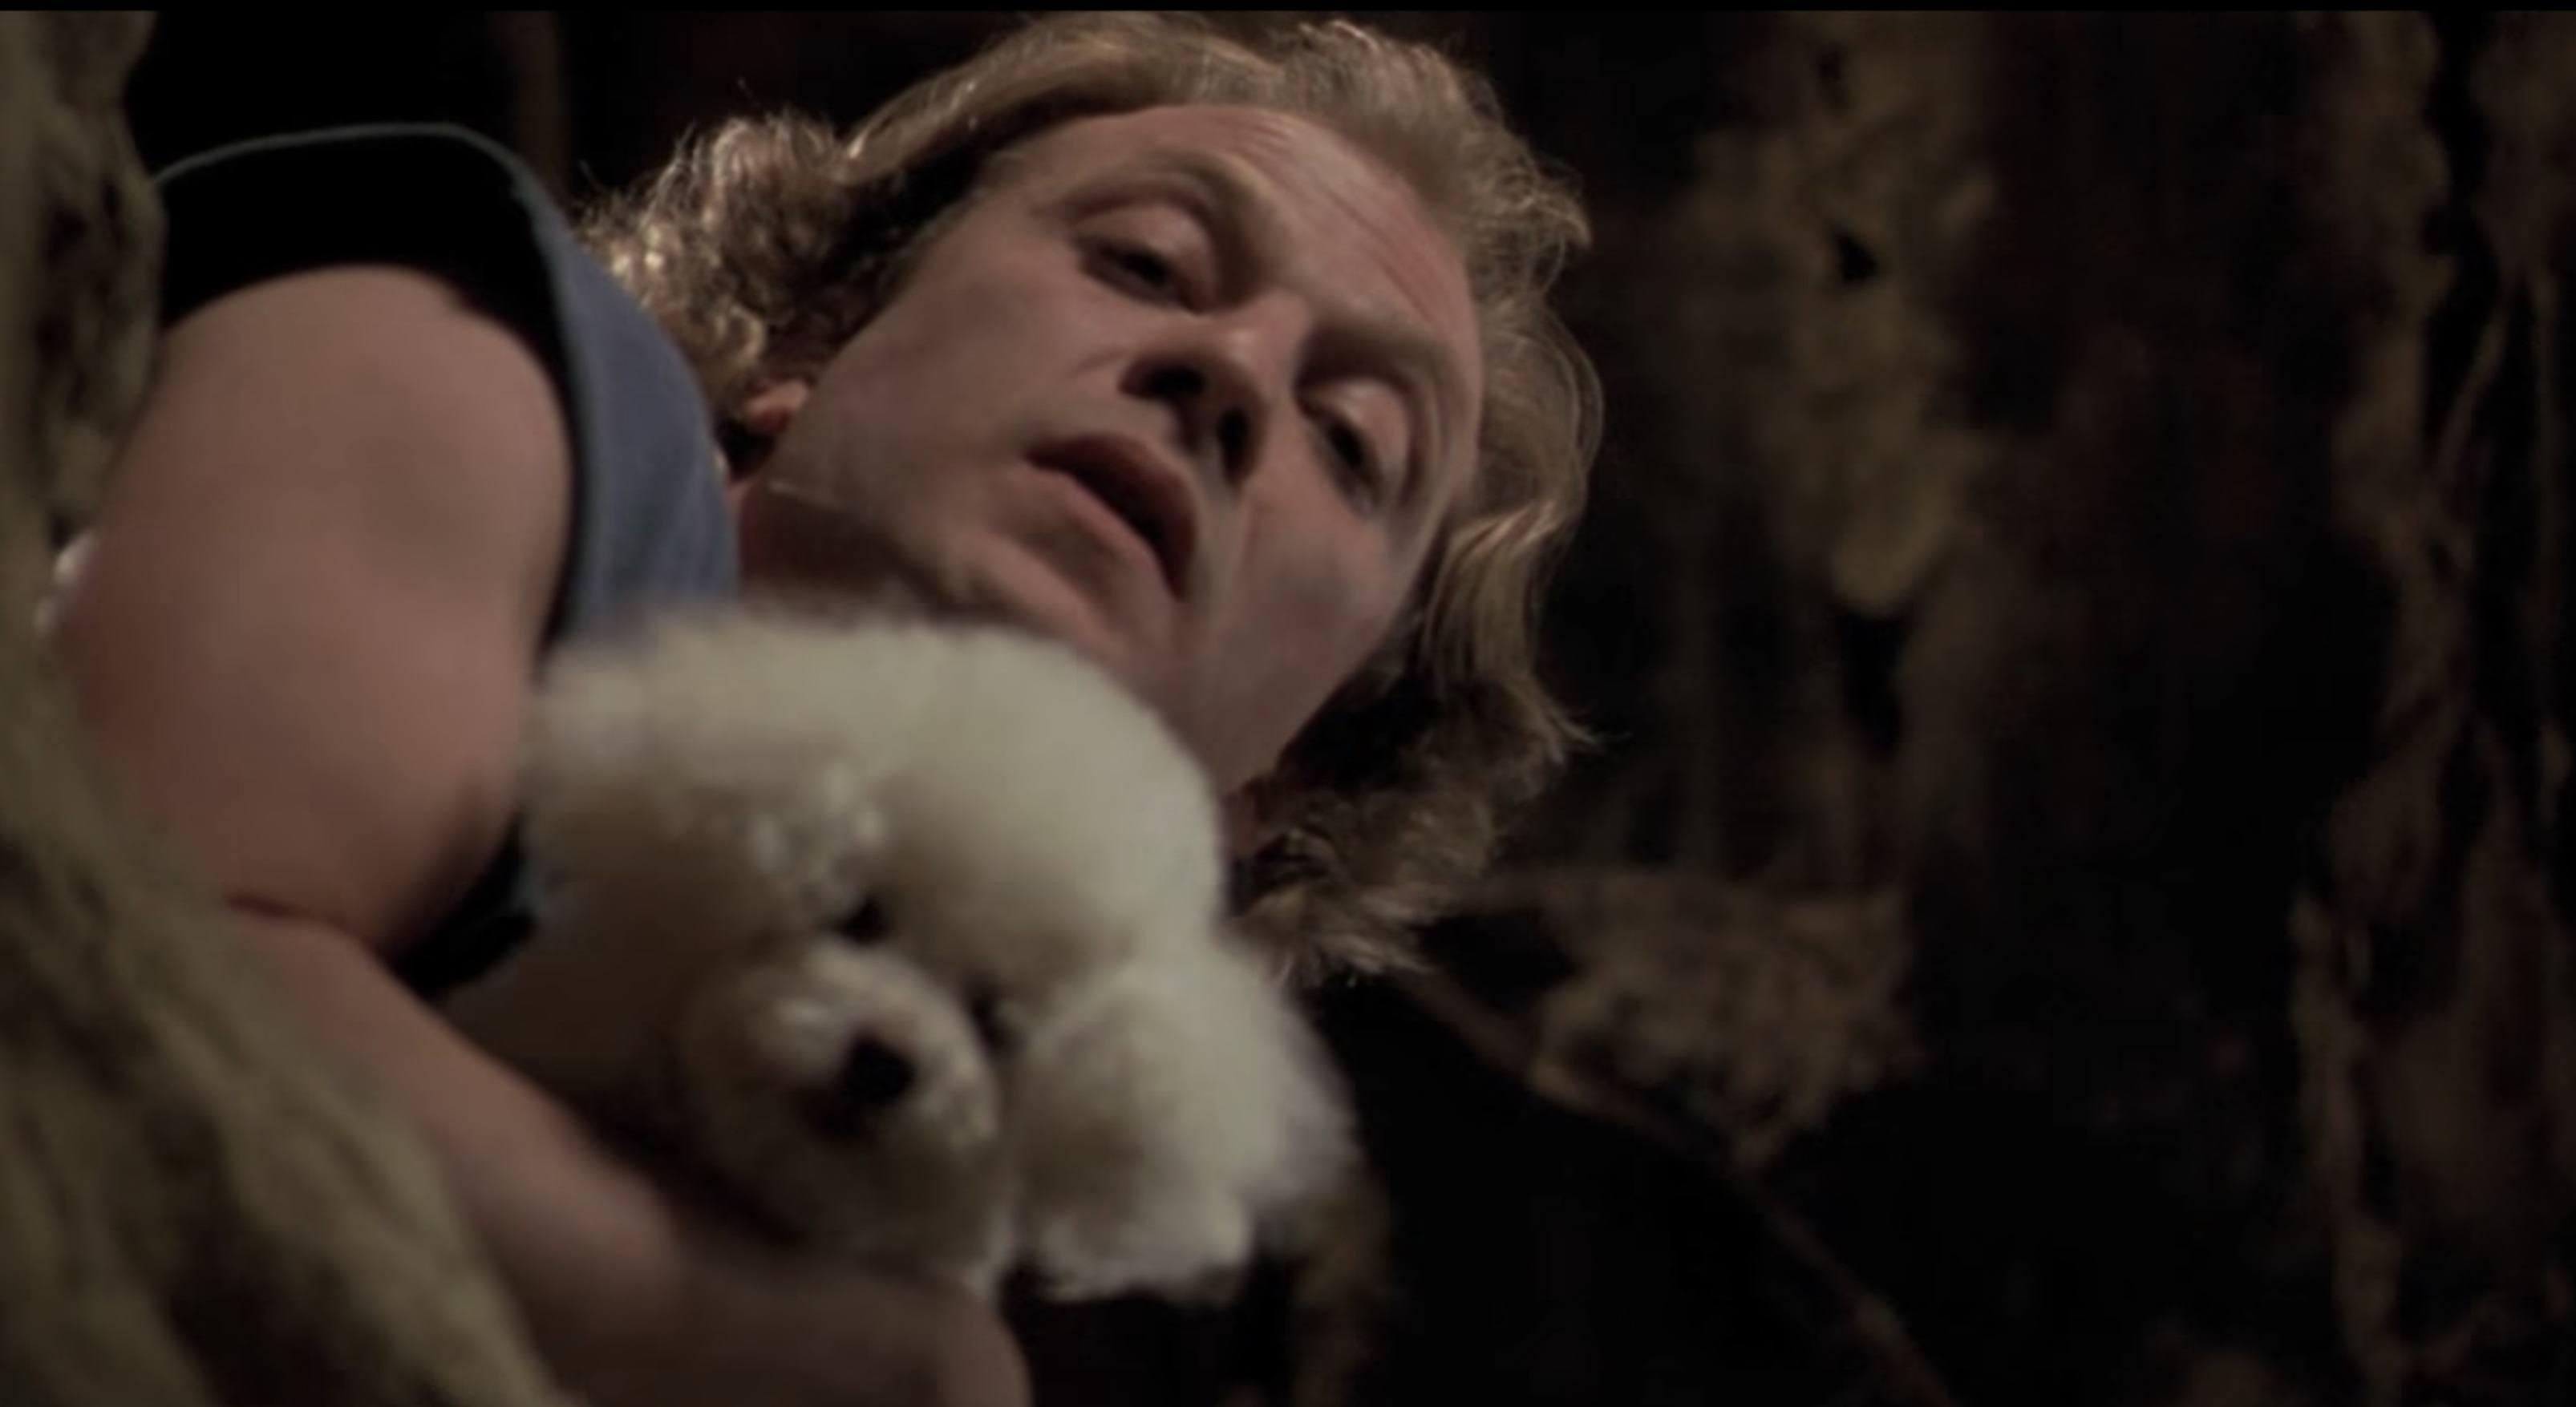 Buffalo Bill telling victim to rub the lotion on its skin